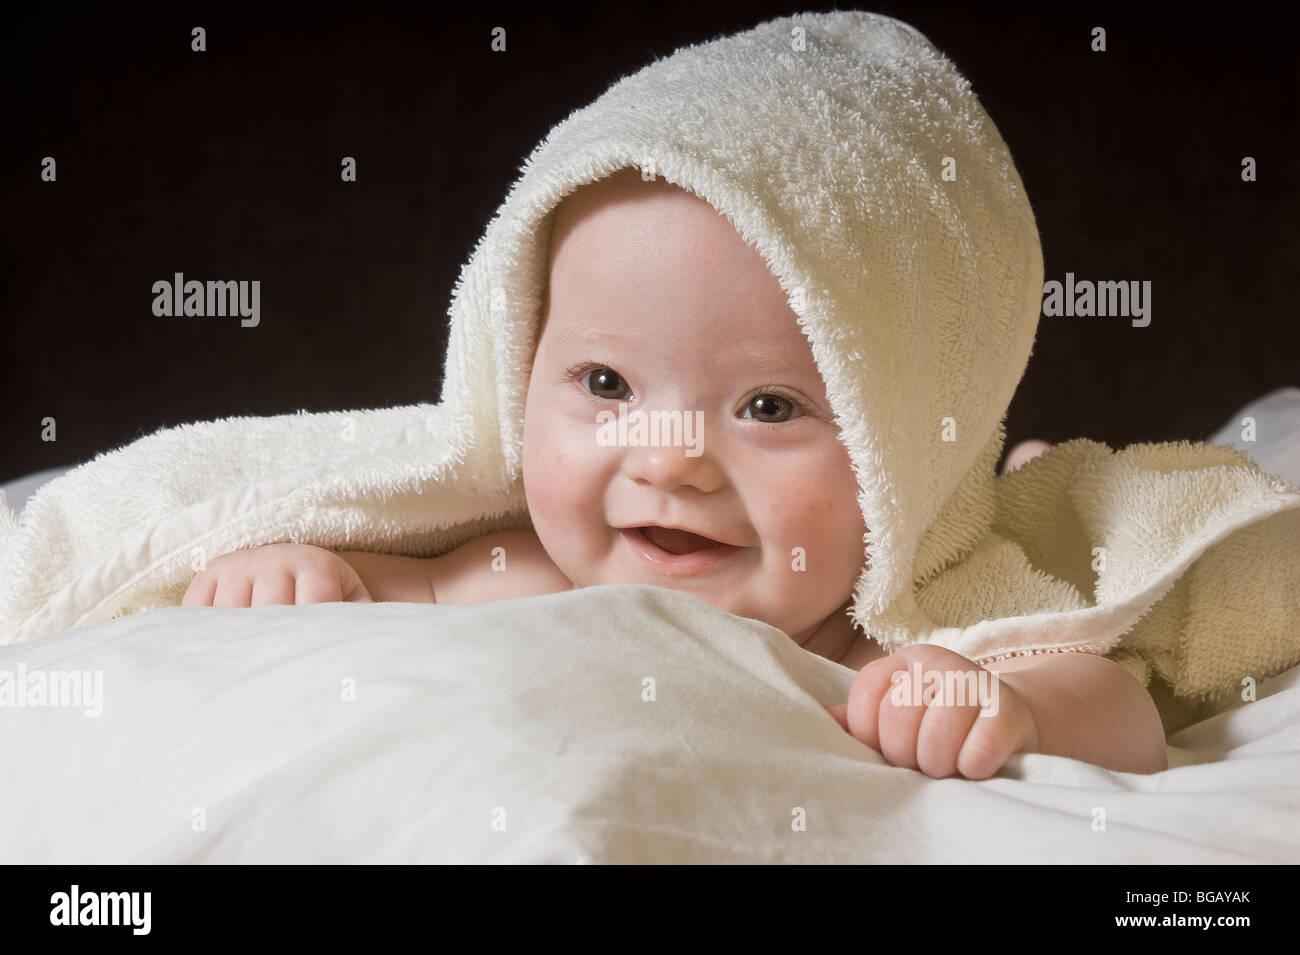 Baby lying on bed - Stock Image